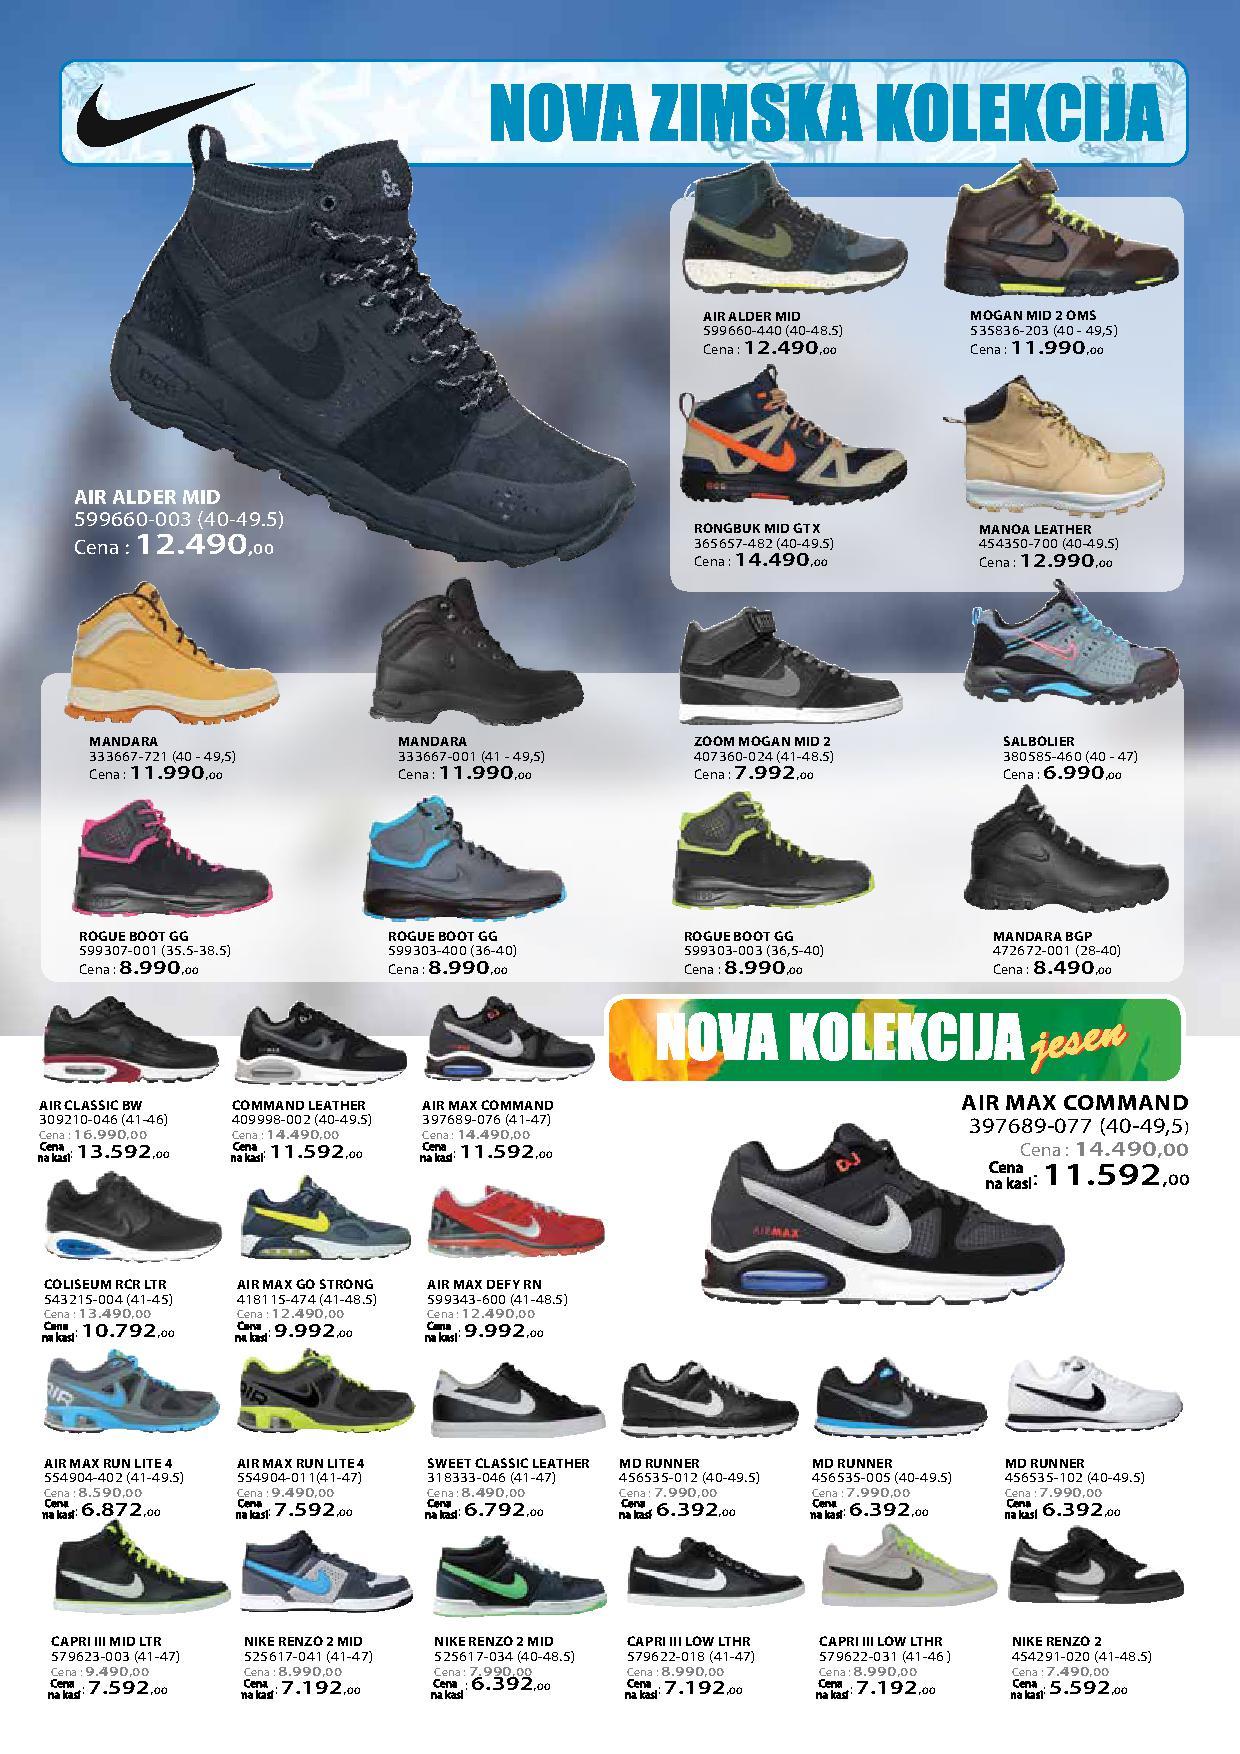 Djak sport katalog super cena